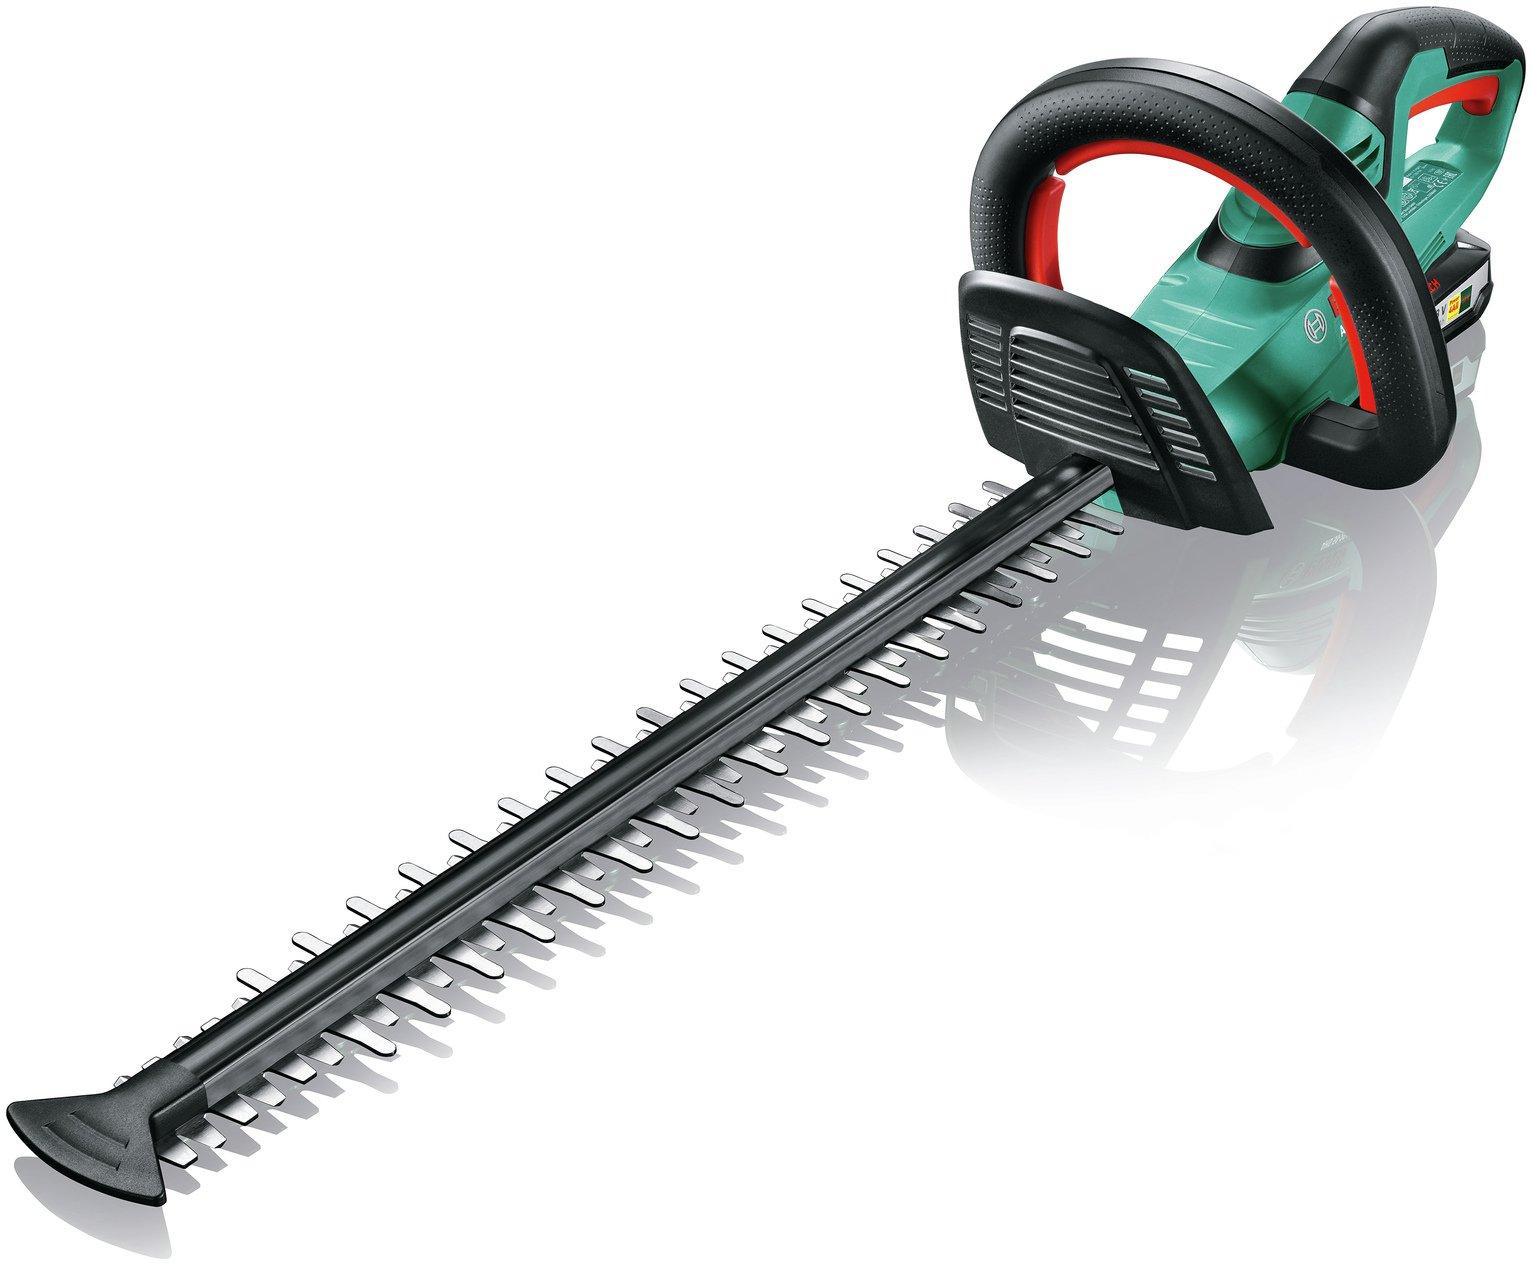 Bosch Ahs 50-20 Li 50cm Cordless Hedge Trimmer - 18V